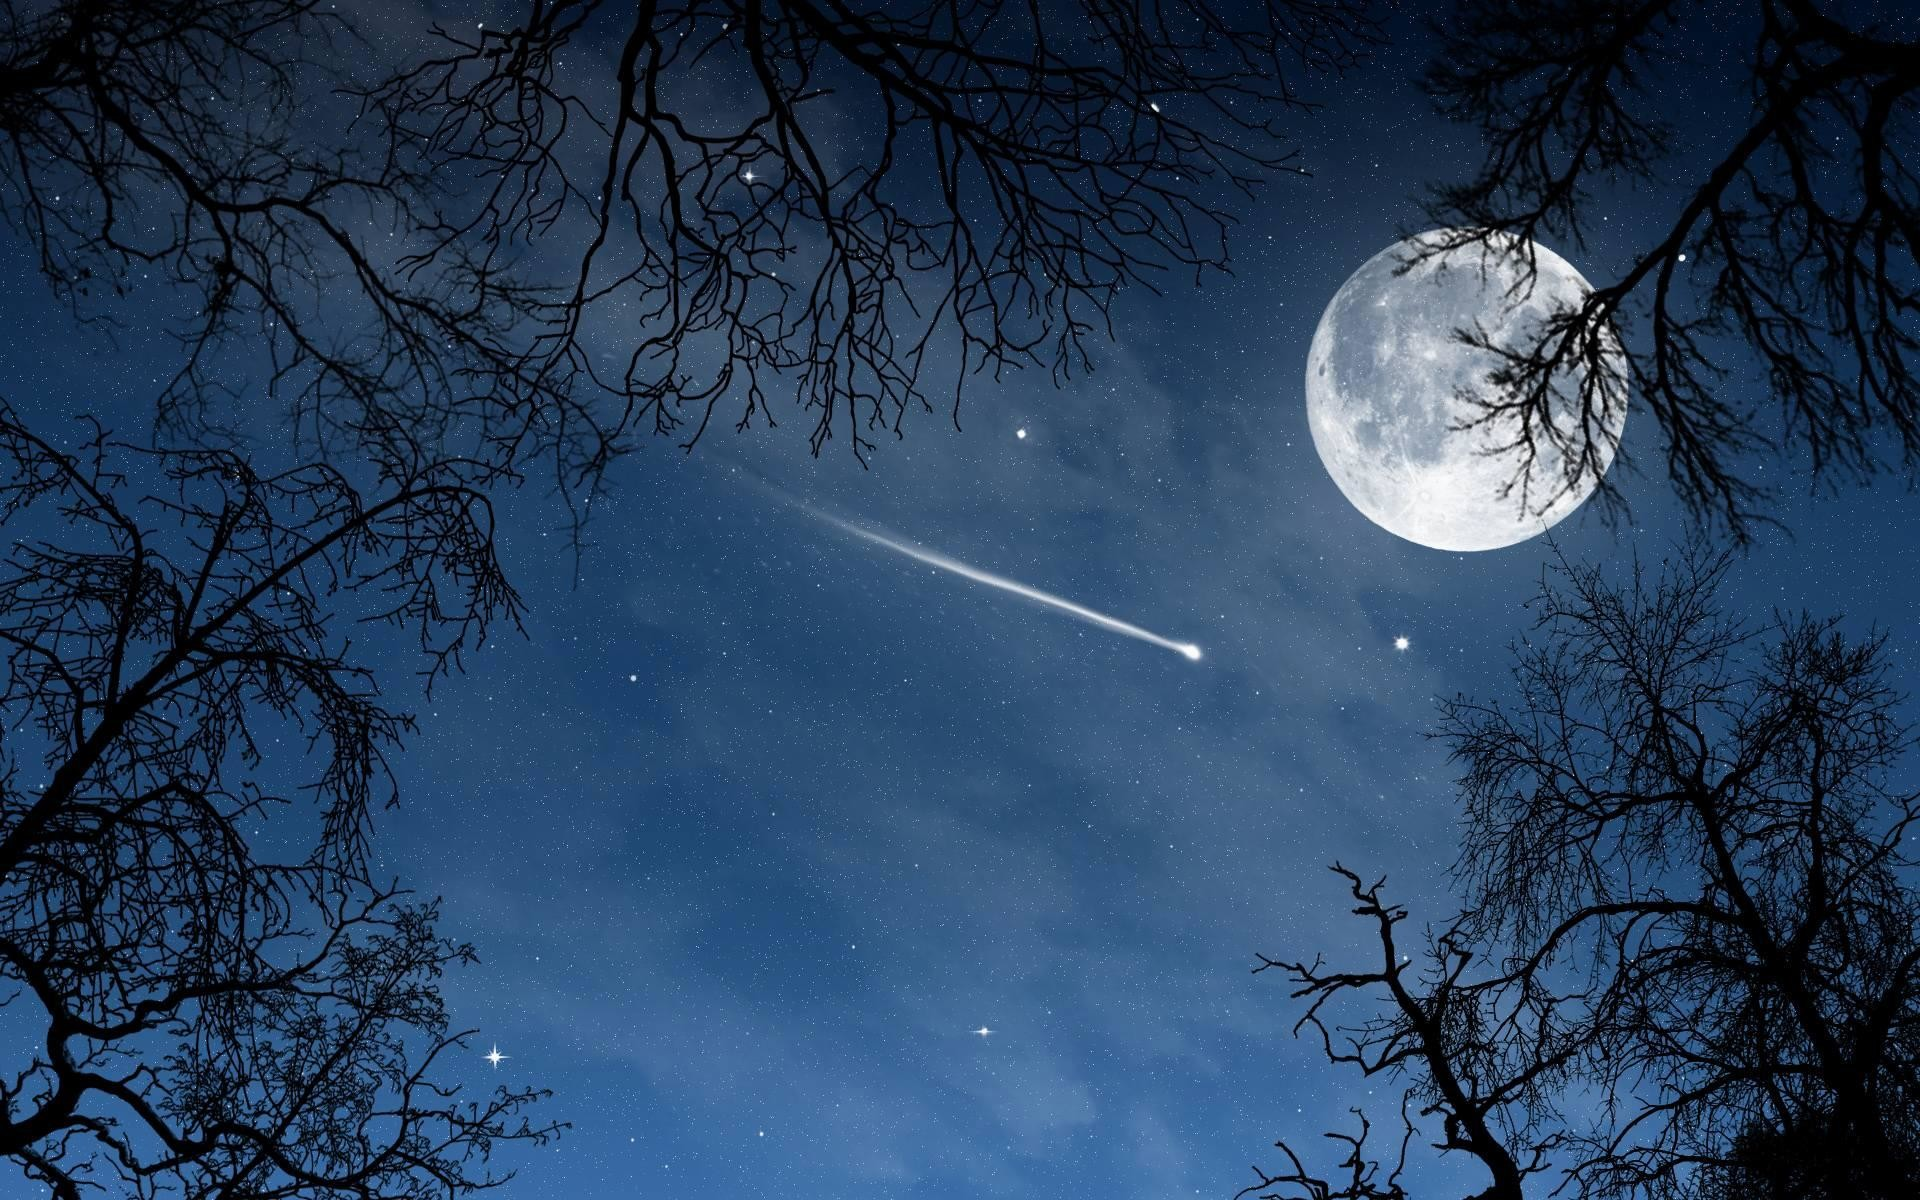 wallpaper.wiki-HD-Sun-Moon-Stars-Background-PIC-